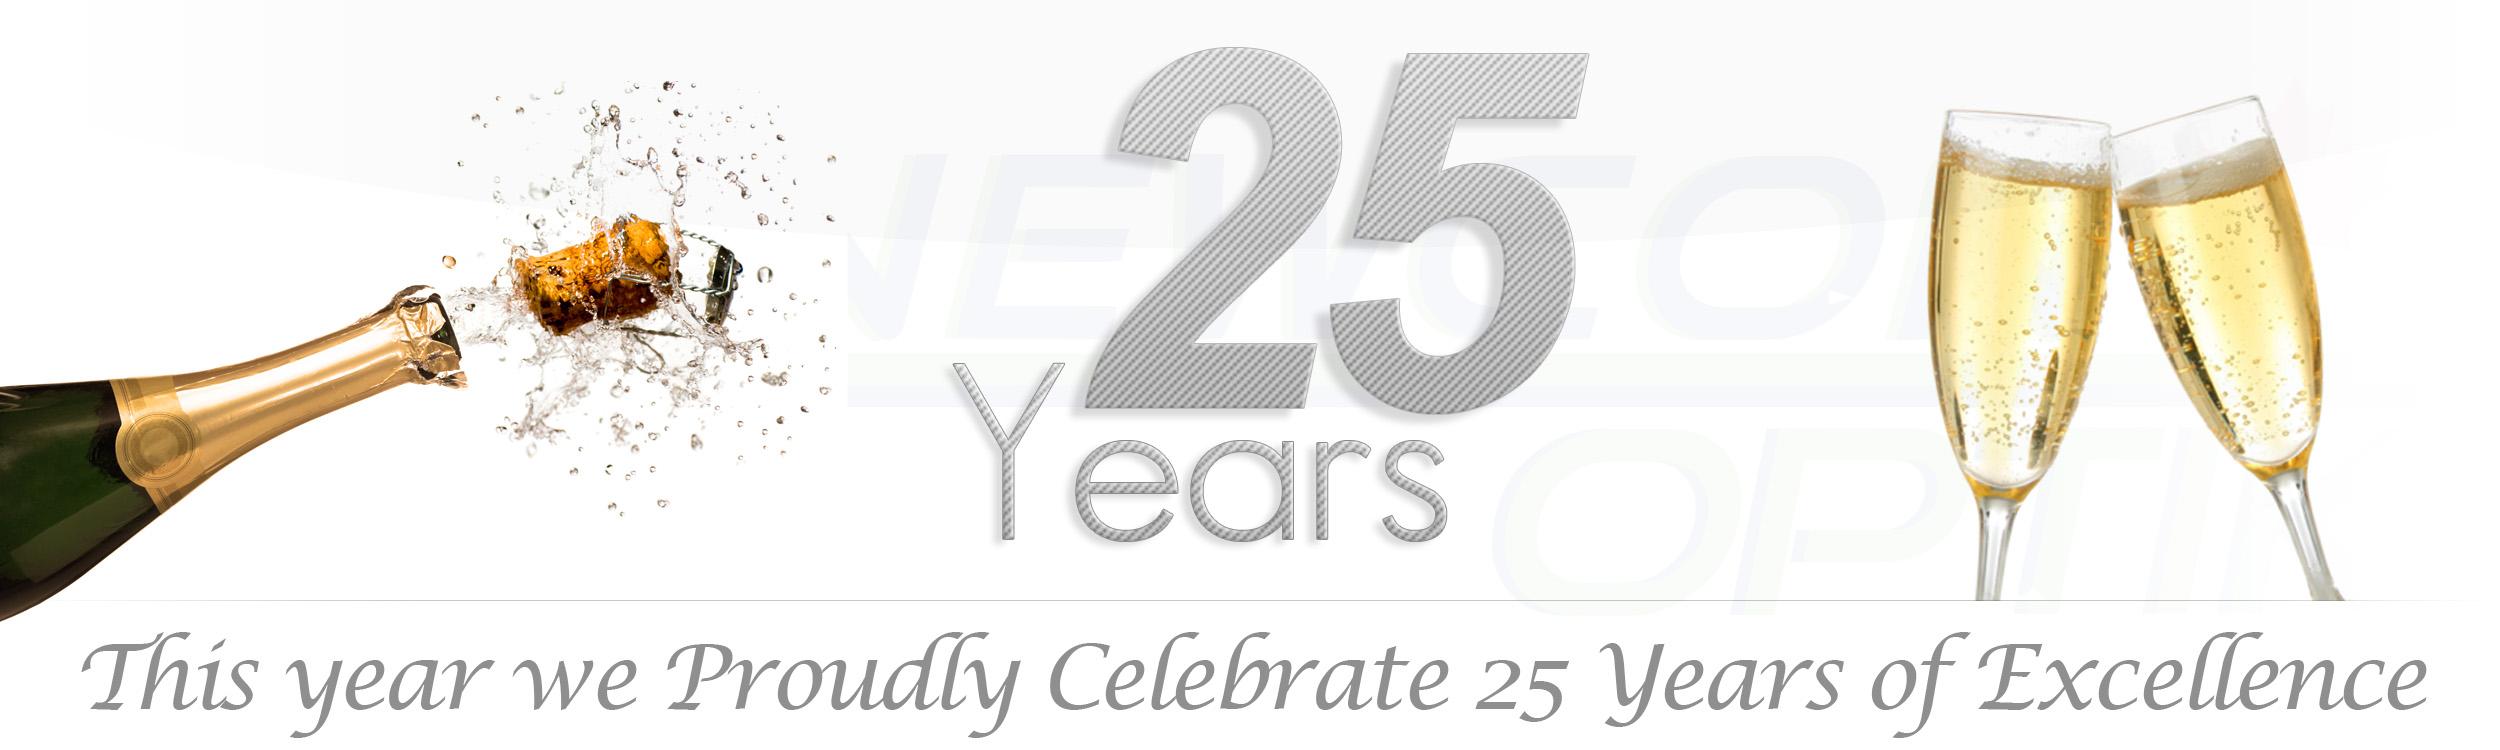 25YEARS2